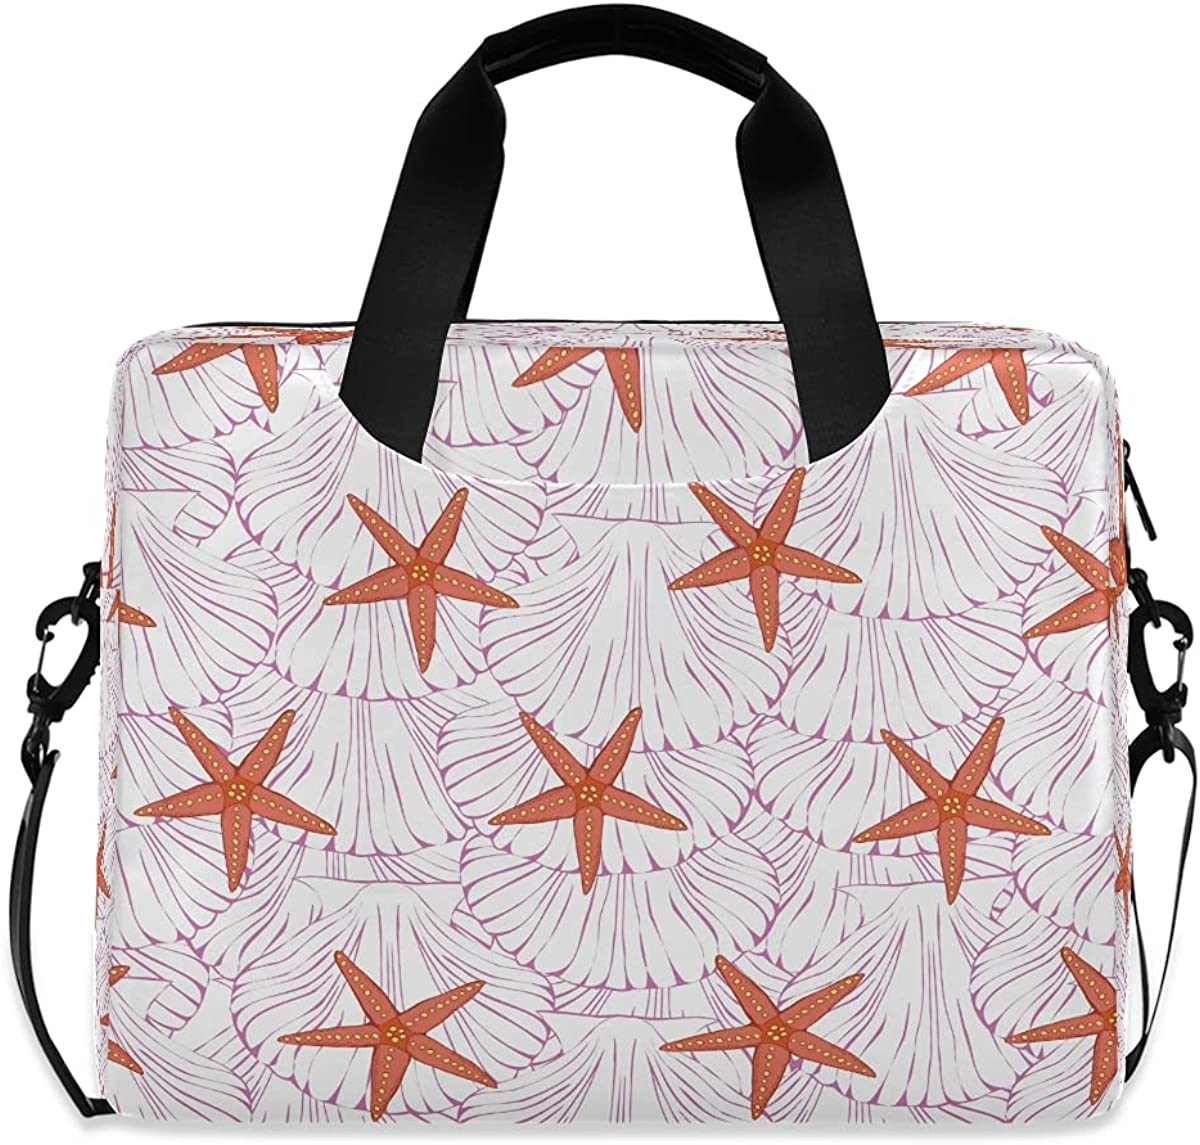 JMbuild New color Laptop Case 15.6 inch Shell Ocean Pattern Compu Starfish Detroit Mall